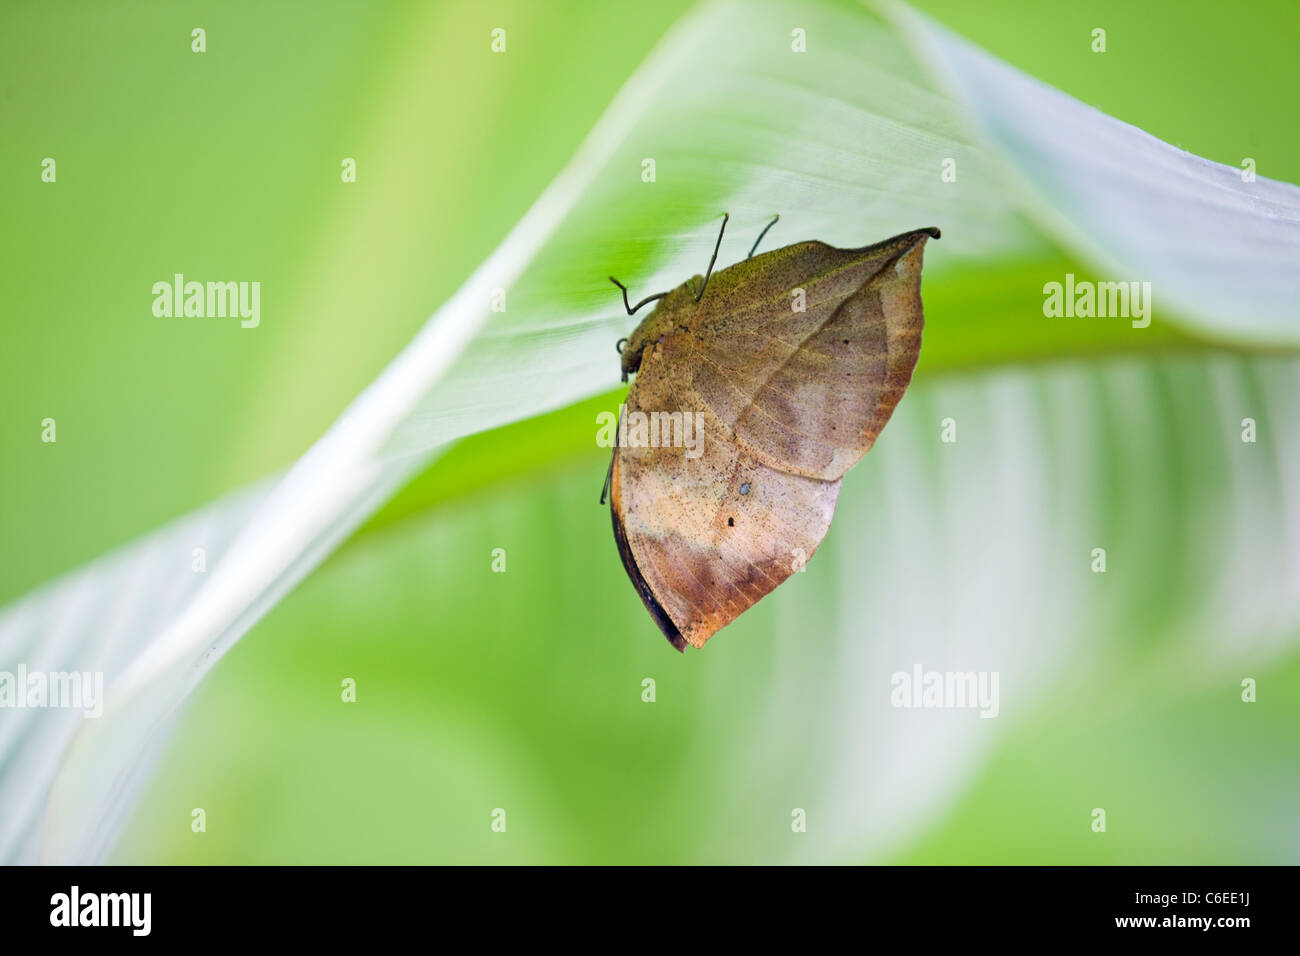 An Orange Oakleaf or Dead Leaf butterfly on a leaf, Kallima inachus - Stock Image